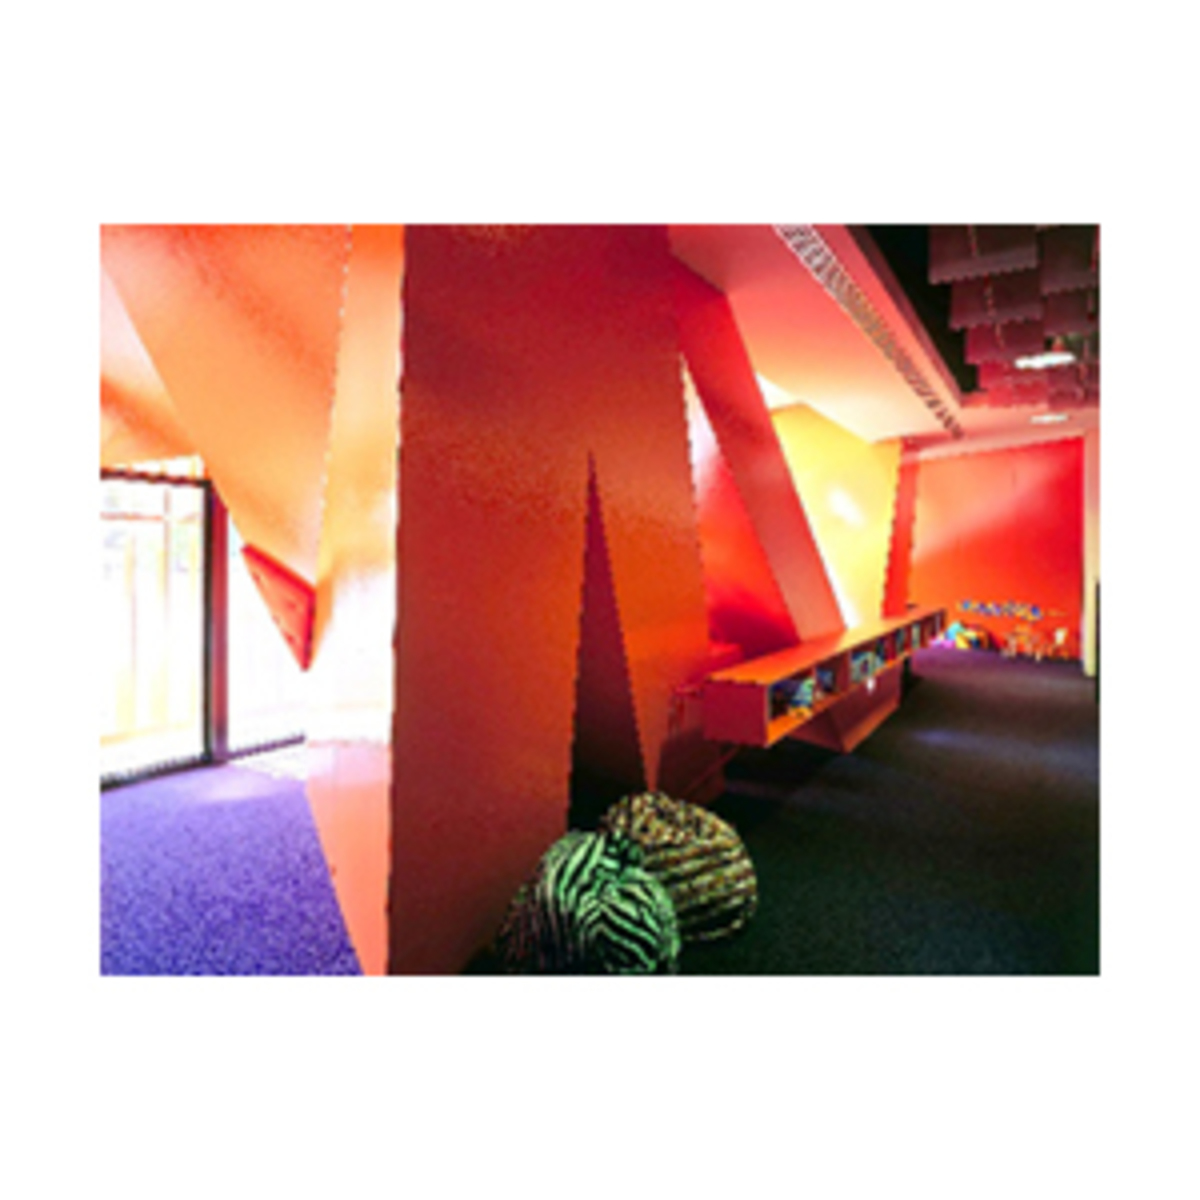 Marion Cultural Centre, PP+ARM<br> Adelaide, Australia, 2002